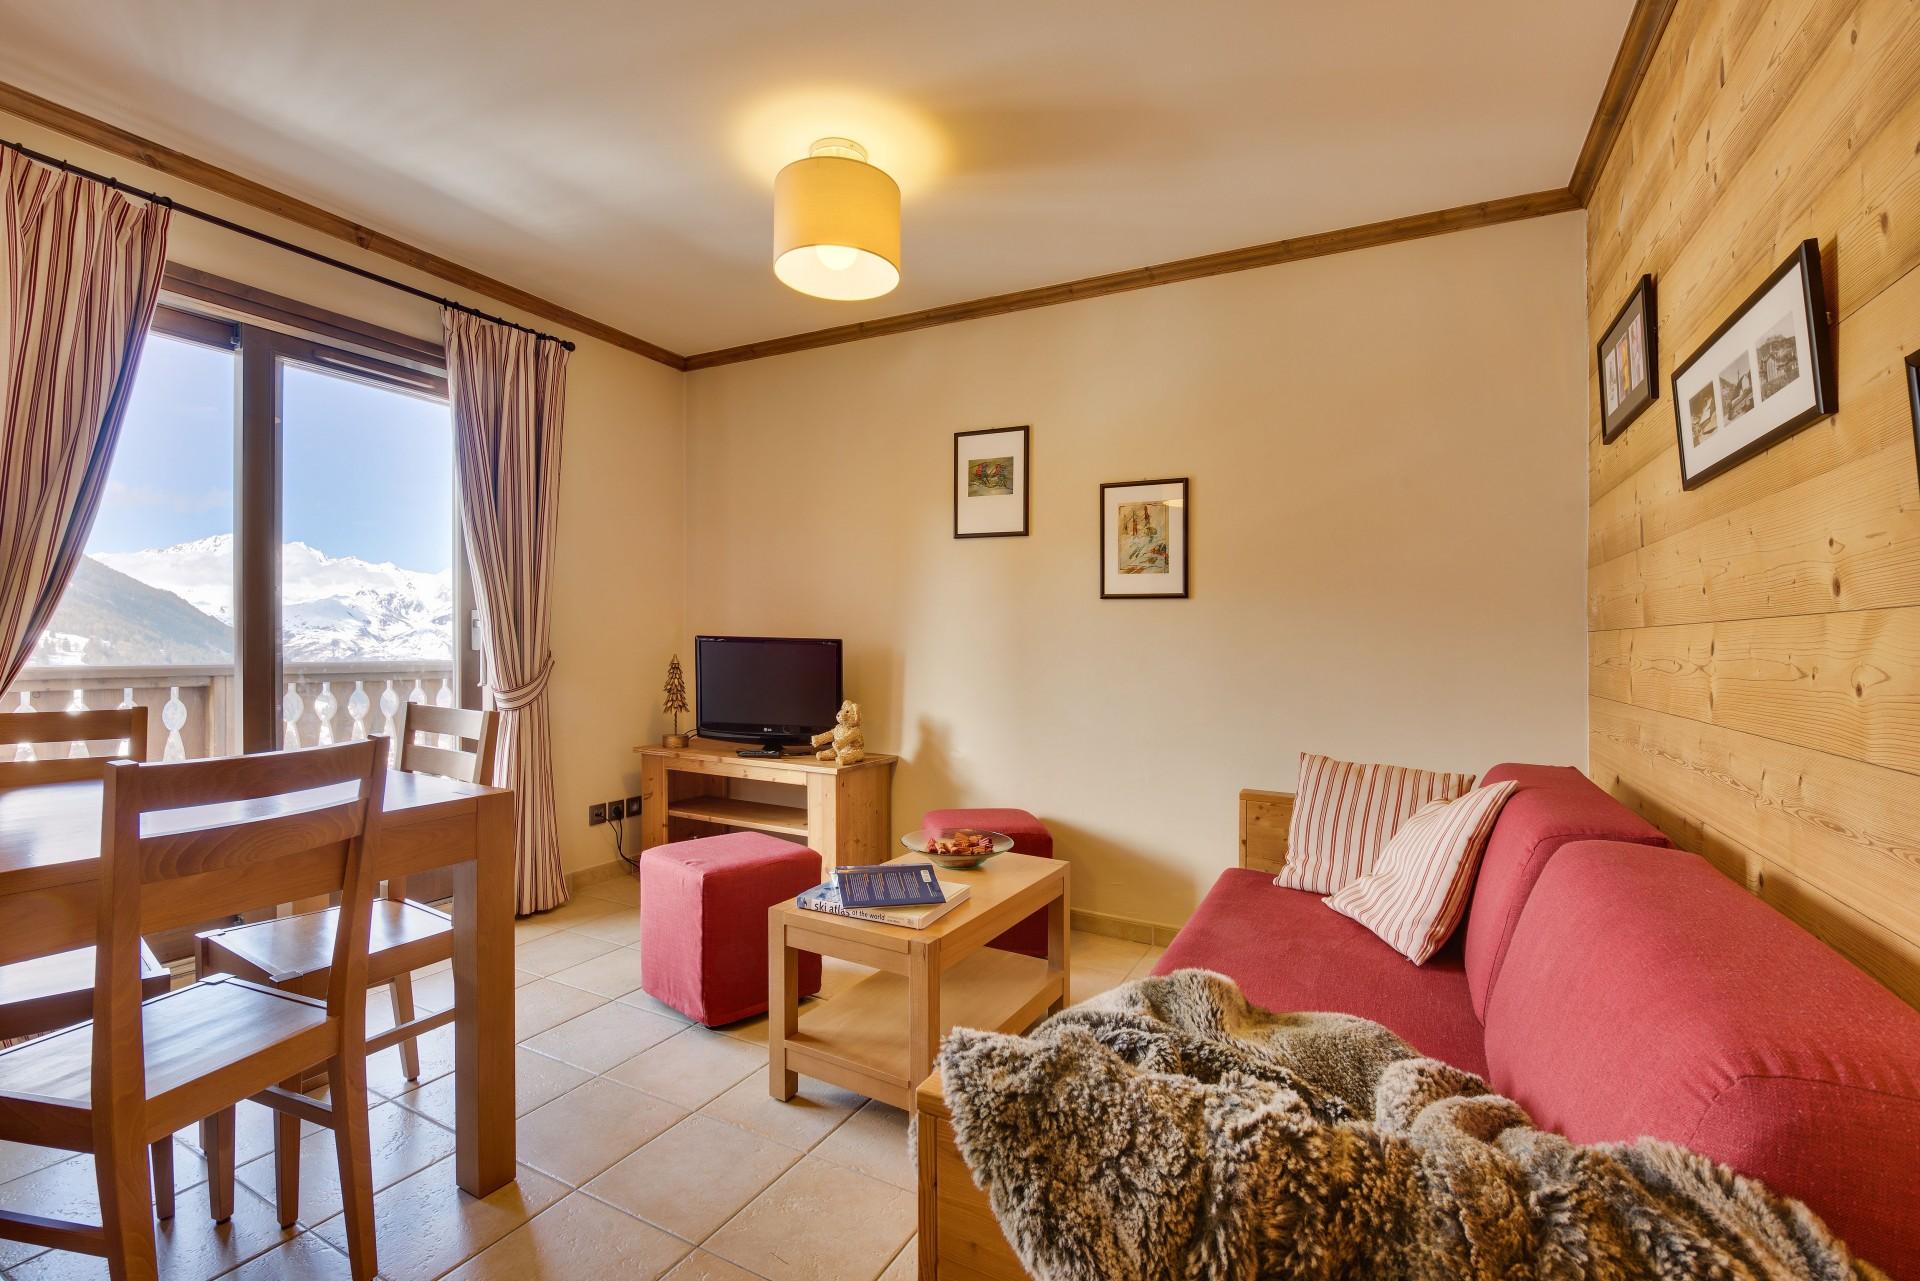 Sainte Foy Tarentaise Location Appartement Luxe Russandite Salon